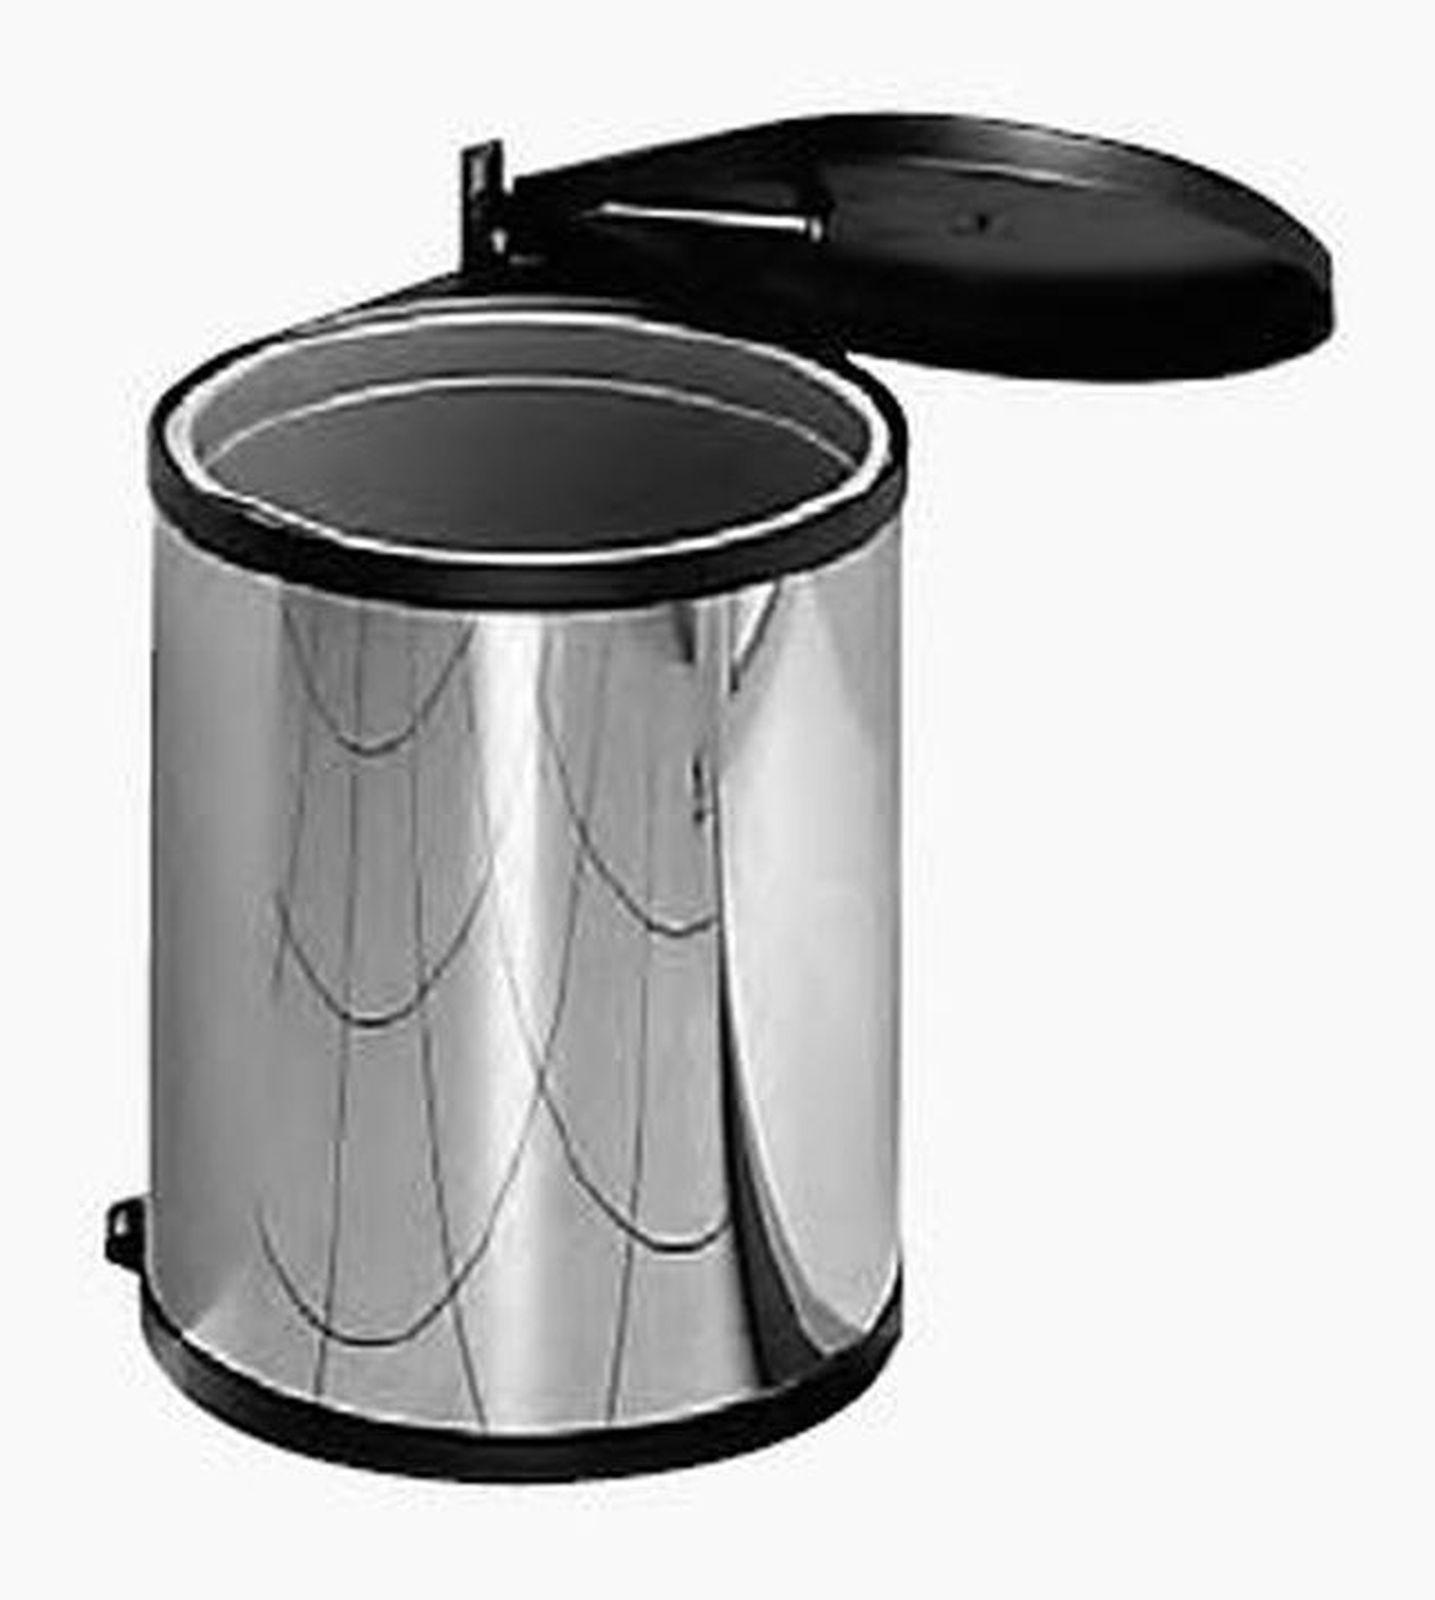 kchen mlleimer simple best ikea kitchen island varde ikea. Black Bedroom Furniture Sets. Home Design Ideas